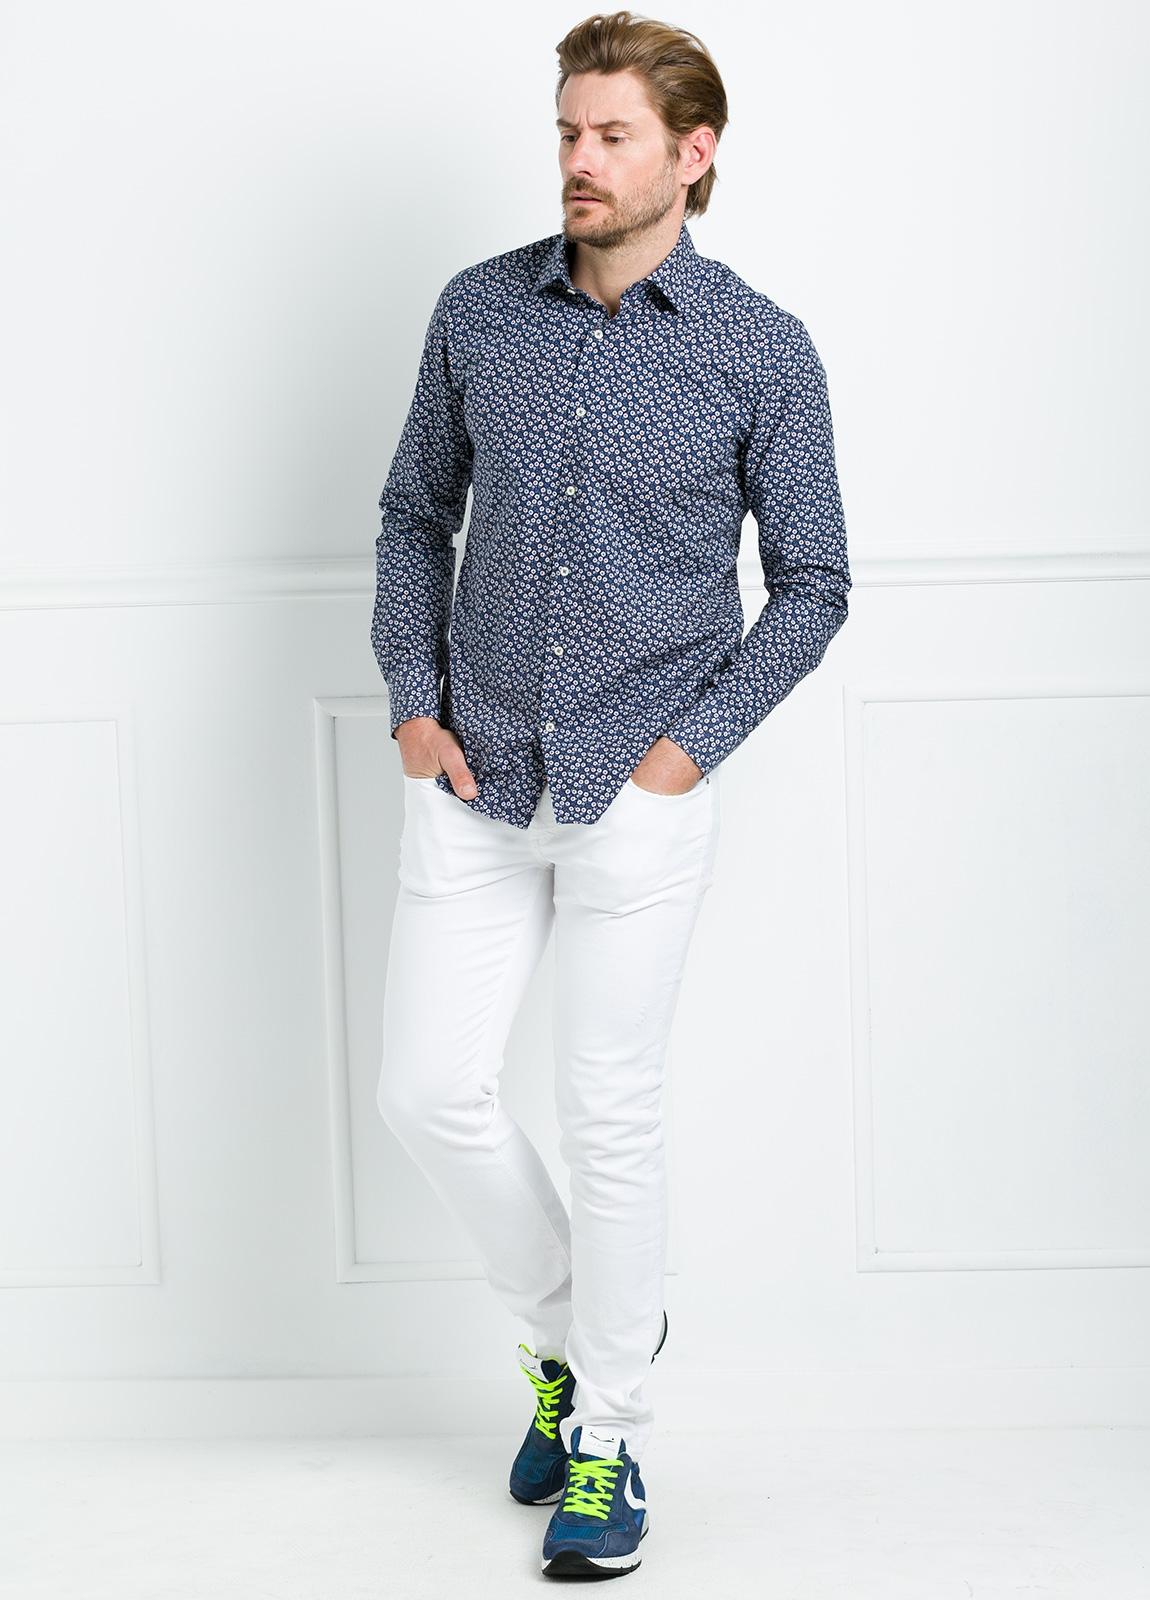 Camisa Leisure Wear SLIM FIT modelo PORTO estampado floral color azul marino. 100% Algodón. - Ítem4